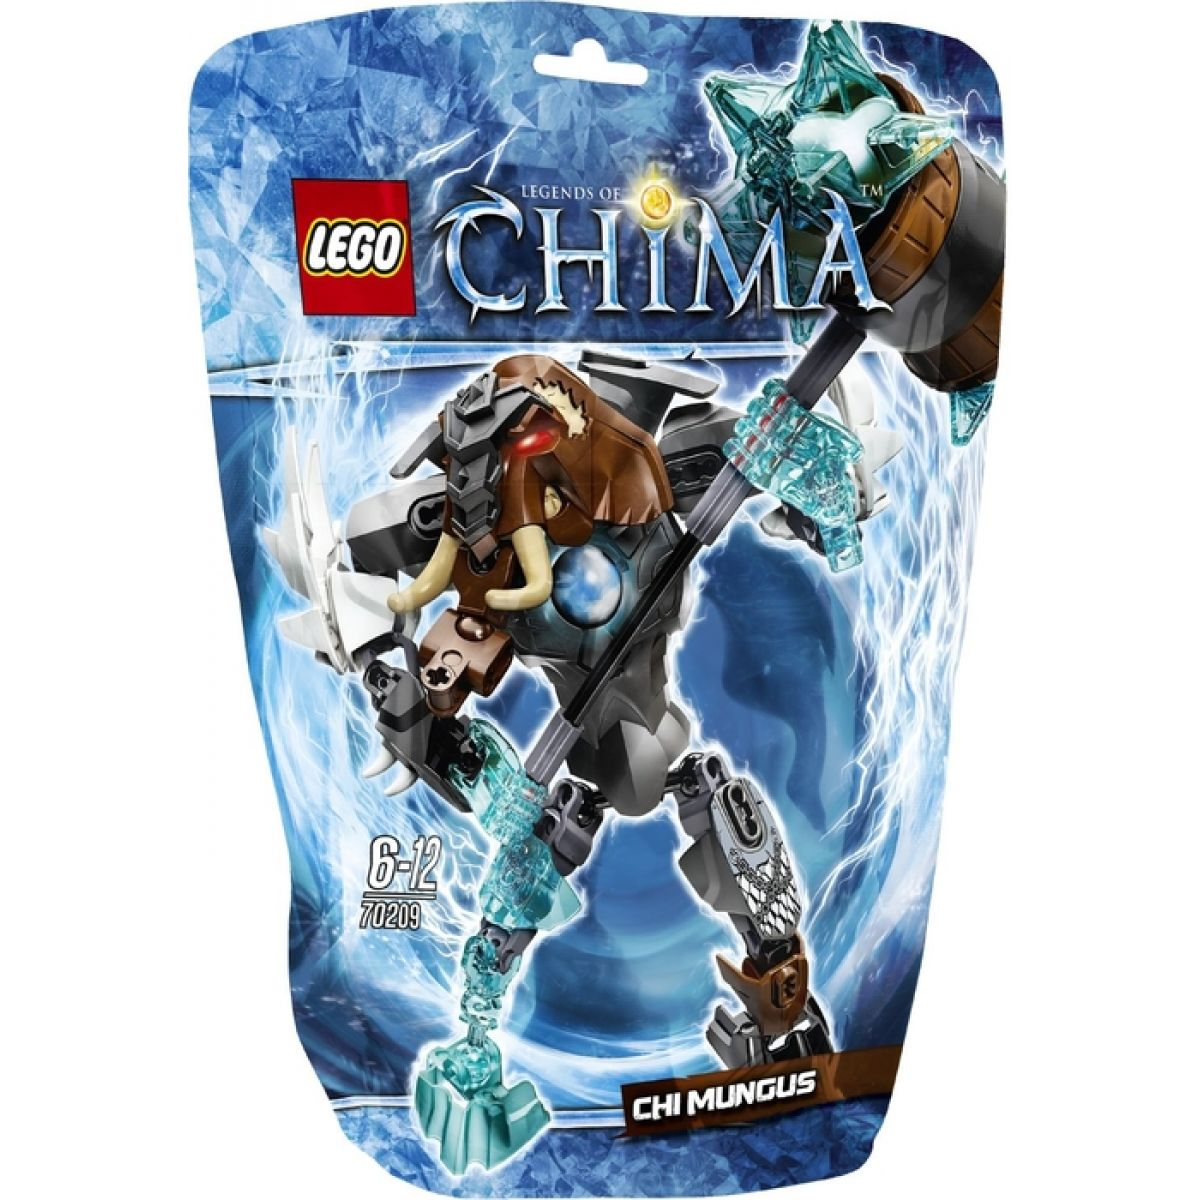 LEGO Chima 70209 Chi Mungus